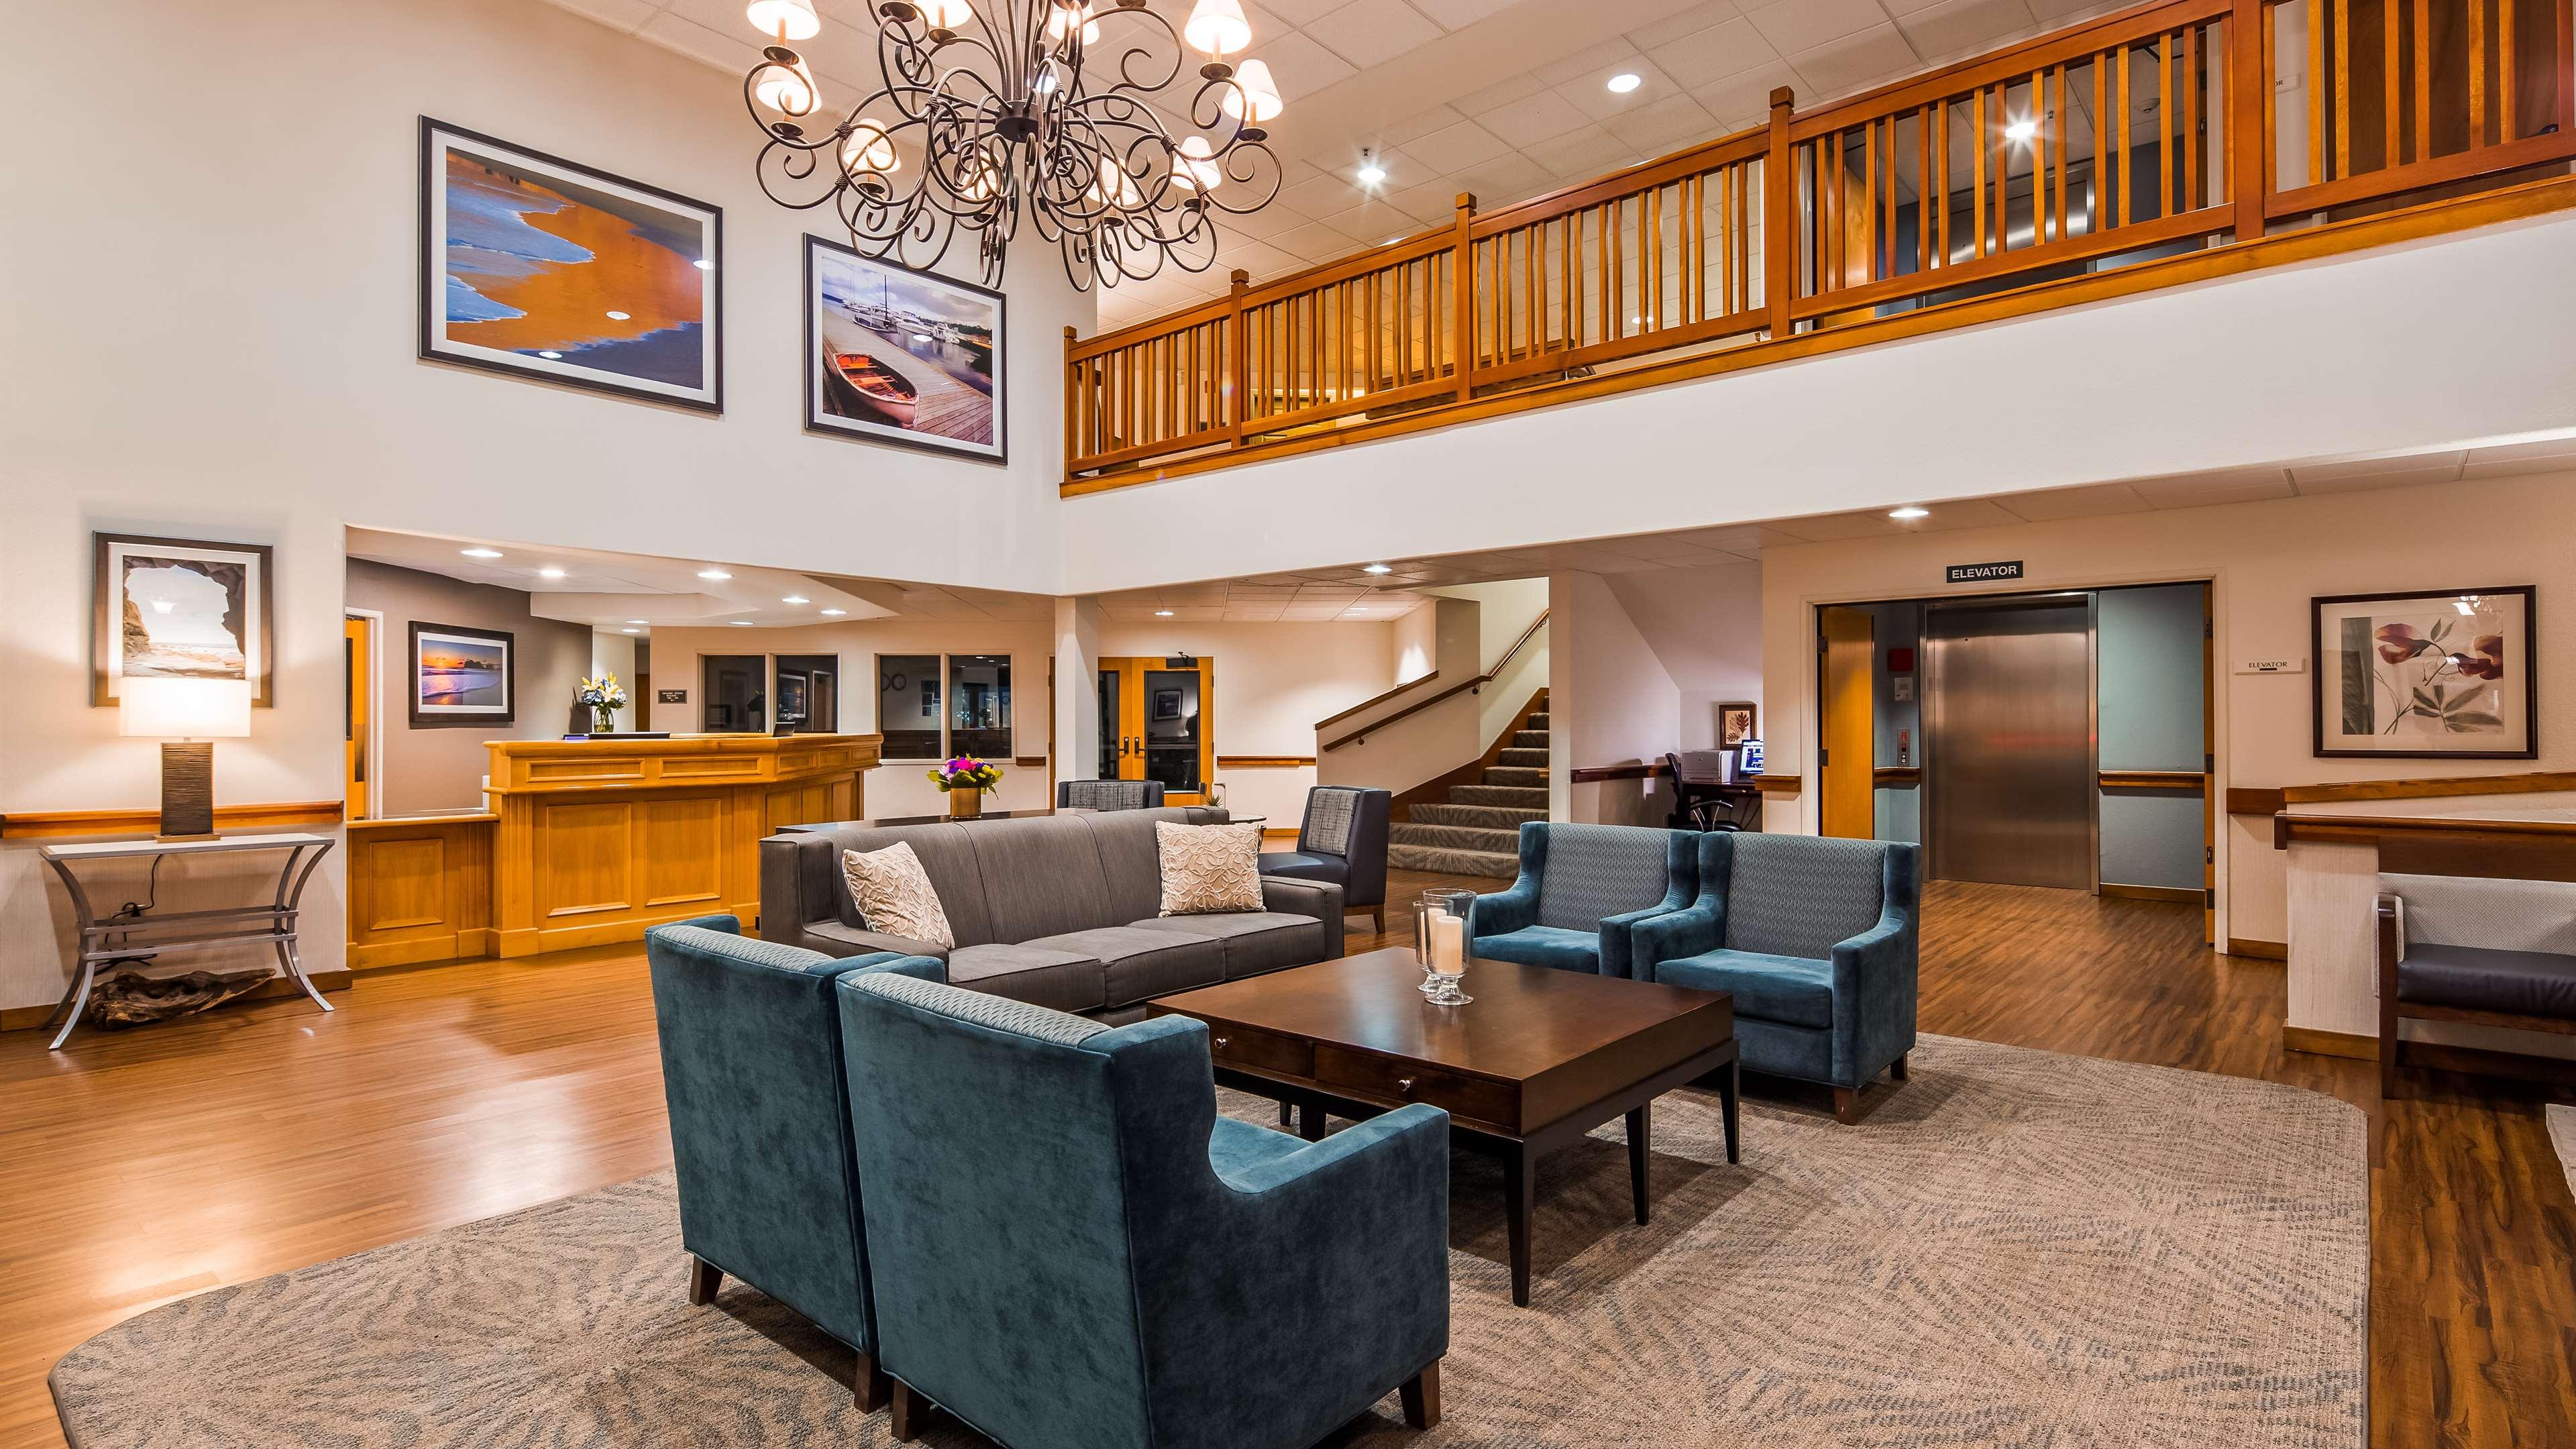 Best Western Plus Edmonds Harbor Inn image 2